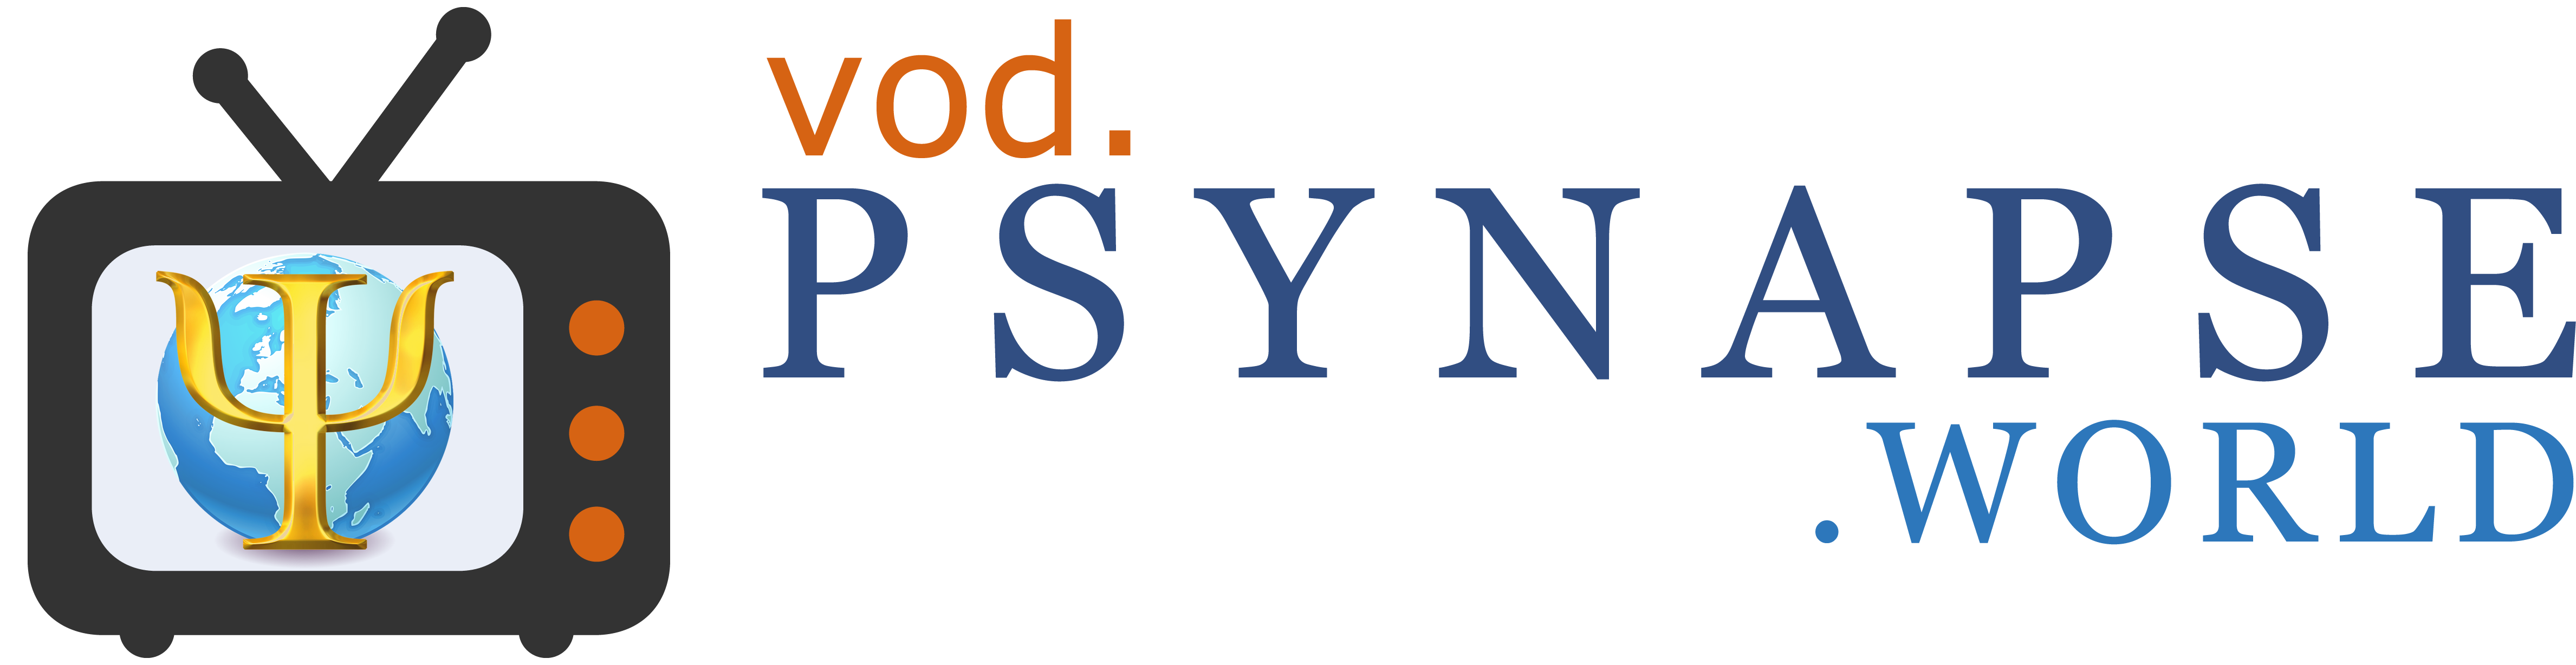 VOD Psynapse